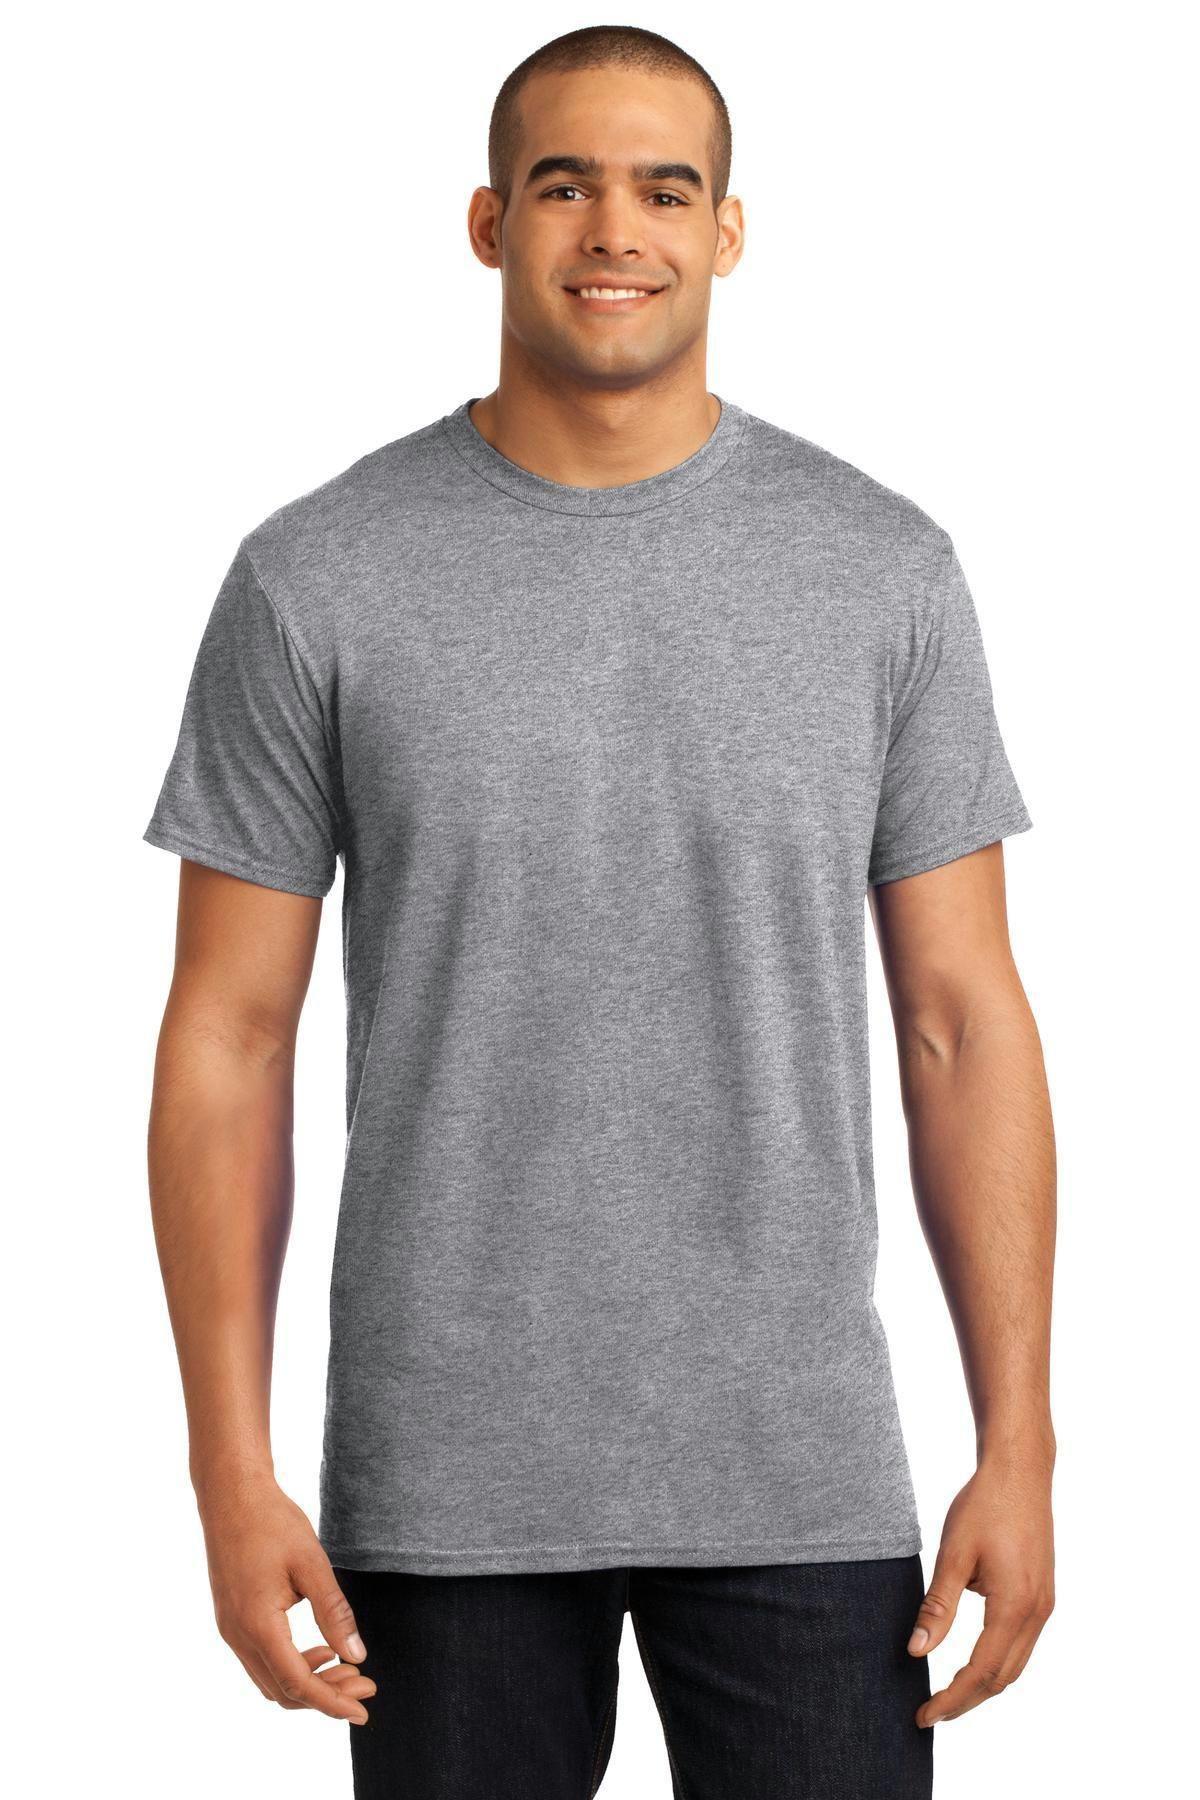 f29b551f9c59 Hanes T Shirts Shrink - Nils Stucki Kieferorthopäde